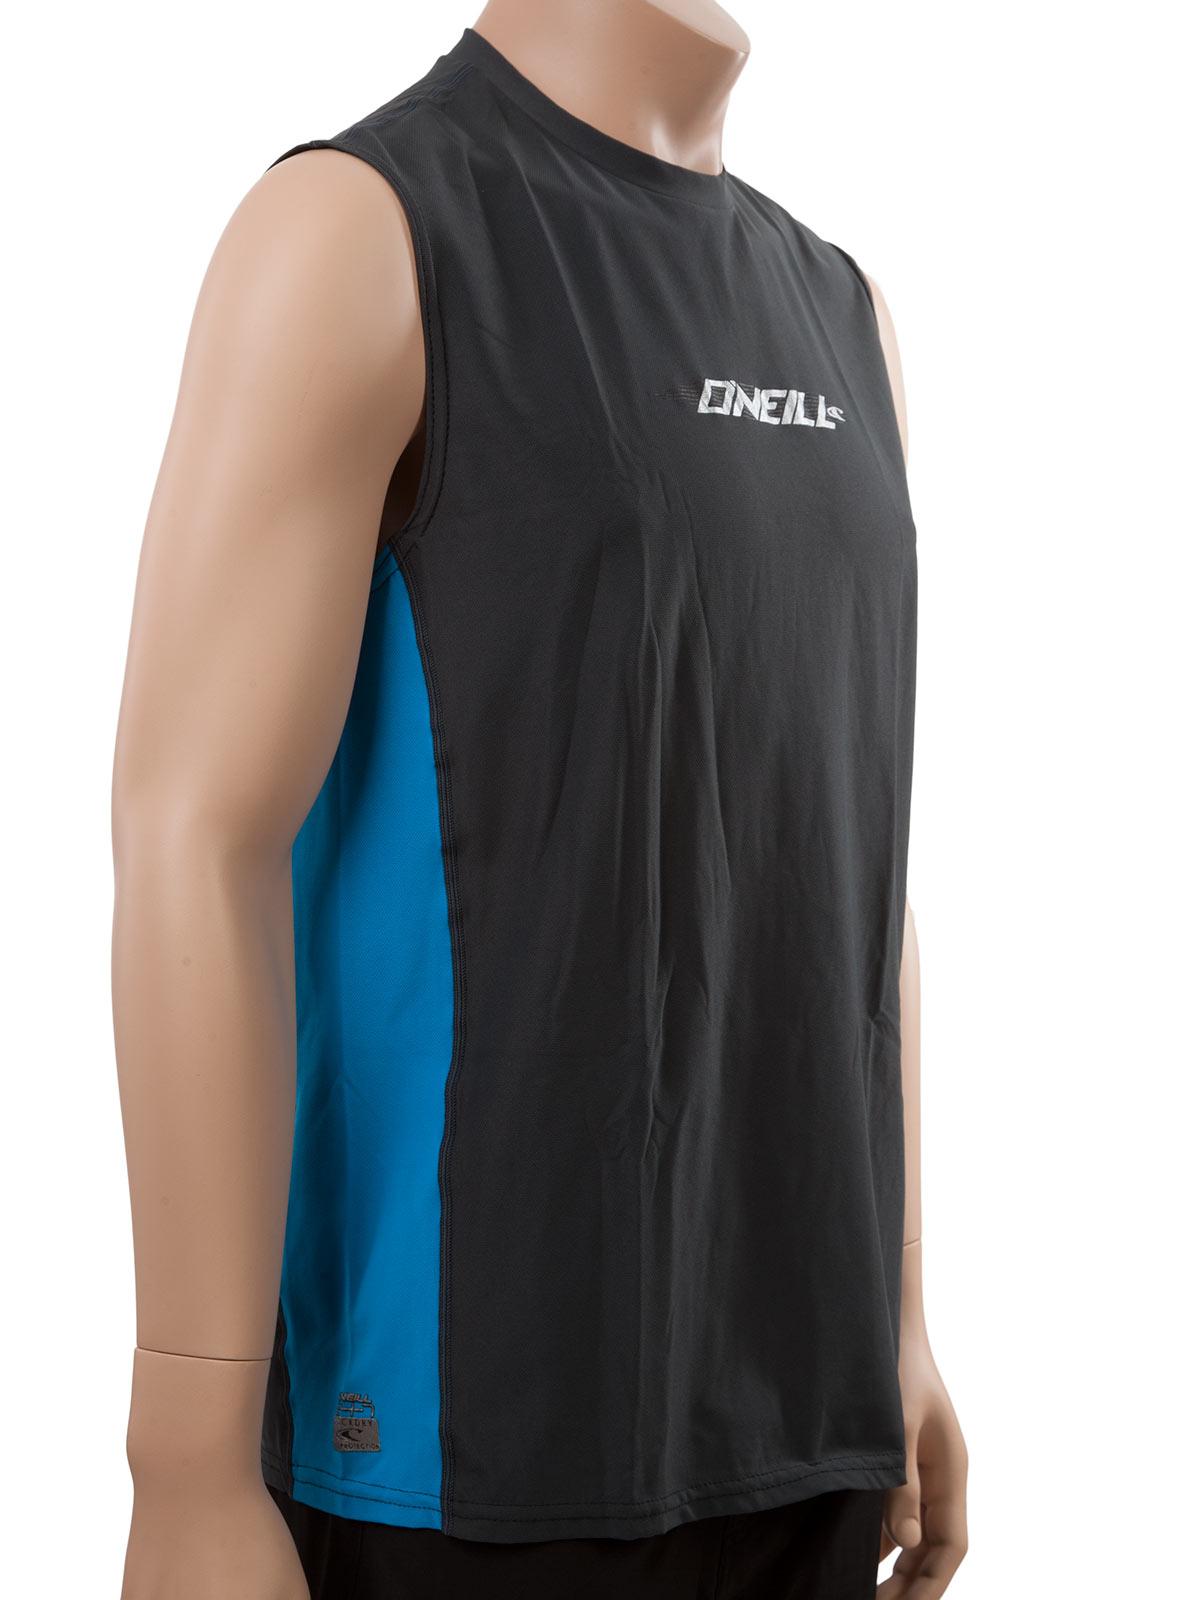 O 39 neill men 39 s rash tee slim fit swim shirt looser fit for Wearing t shirt in swimming pool